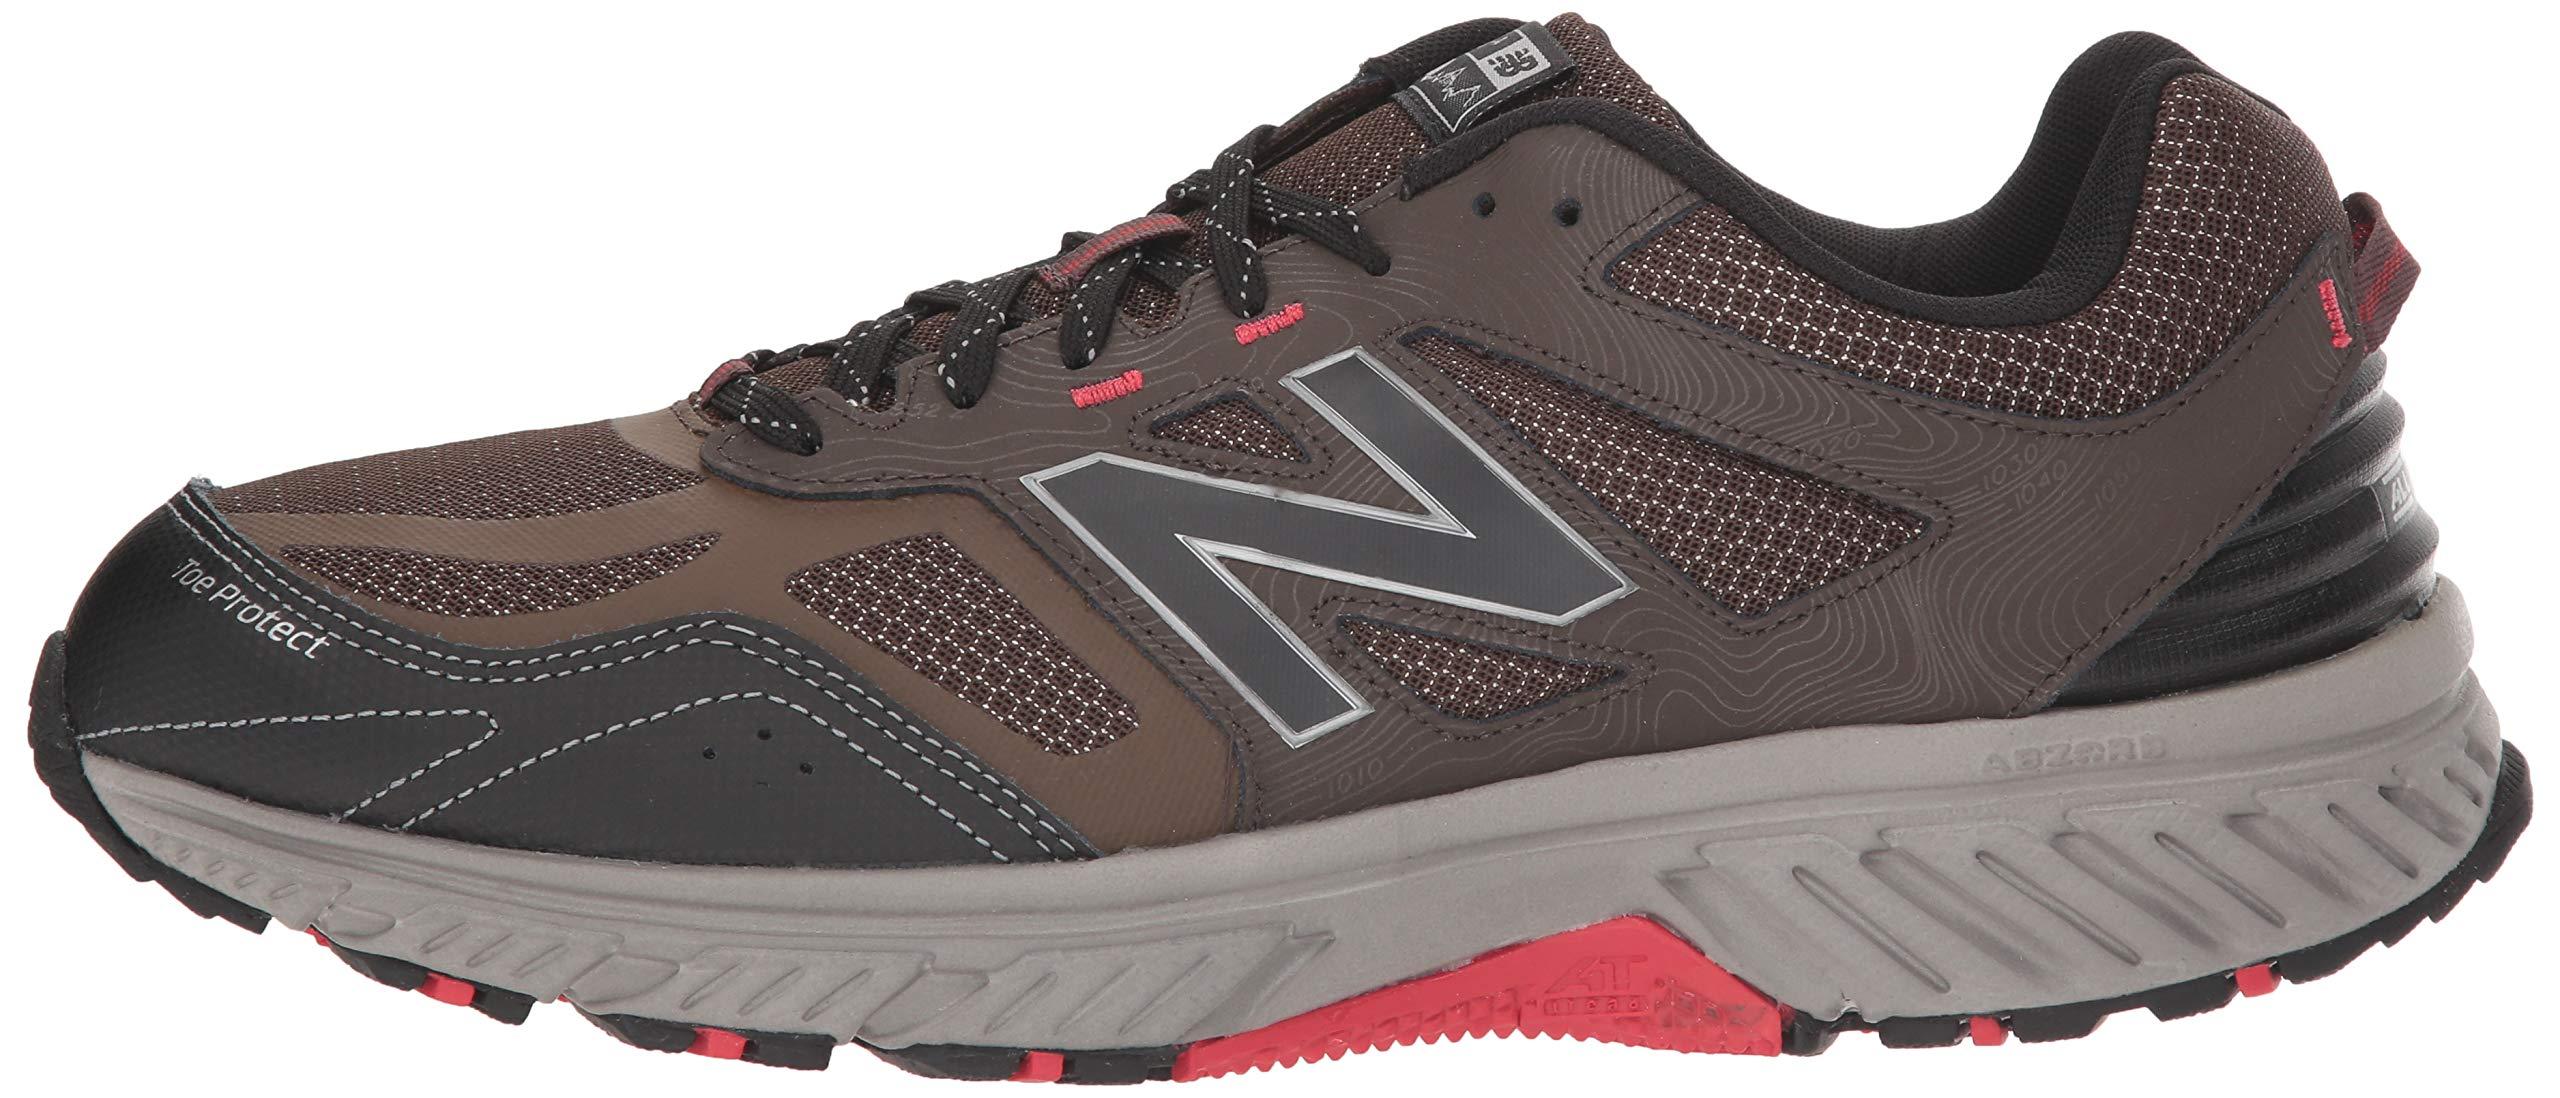 New Balance Men's 510v4 Cushioning Trail Running Shoe, Chocolate/Black/Team red, 7 D US by New Balance (Image #5)